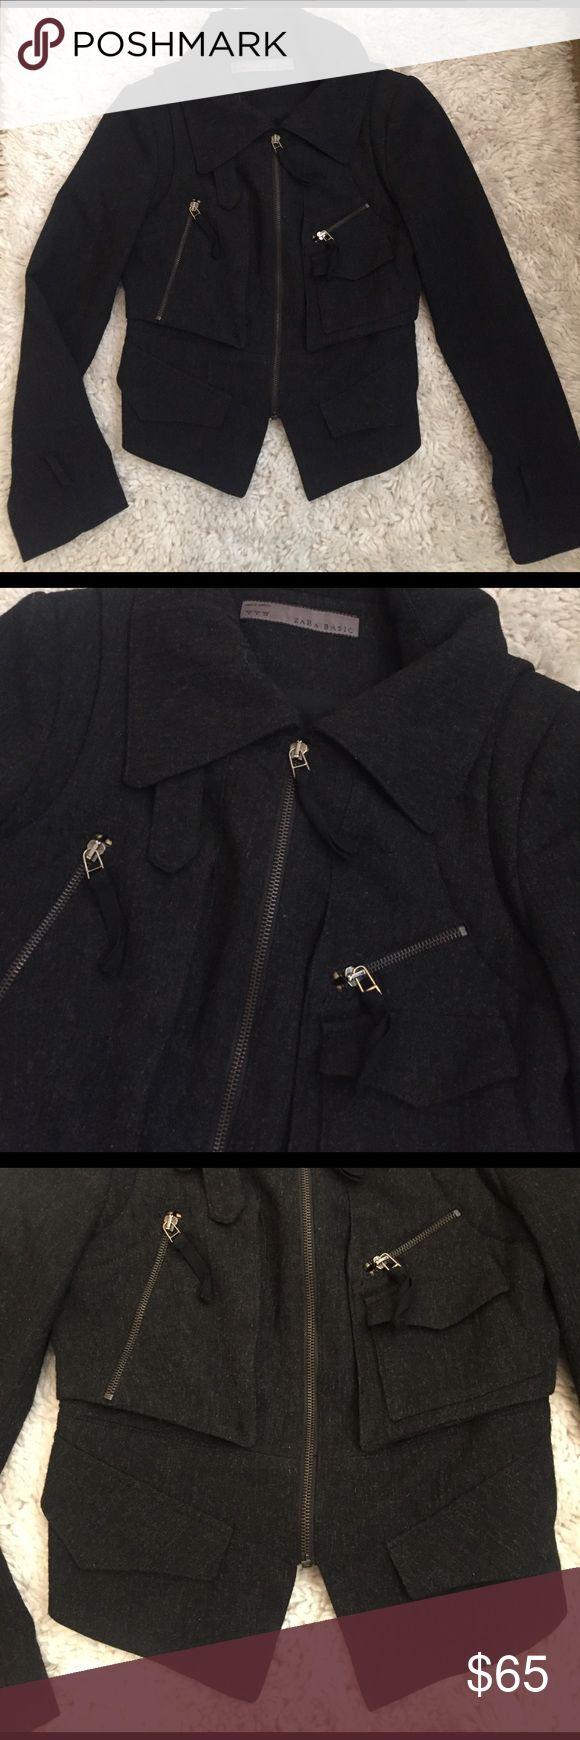 Zara winter coat, size M Charcoal black. Size M. Zara winter coat. Sliming fit, front zipper. Very good condition, worn 3 or 4 times. Zara Jackets & Coats